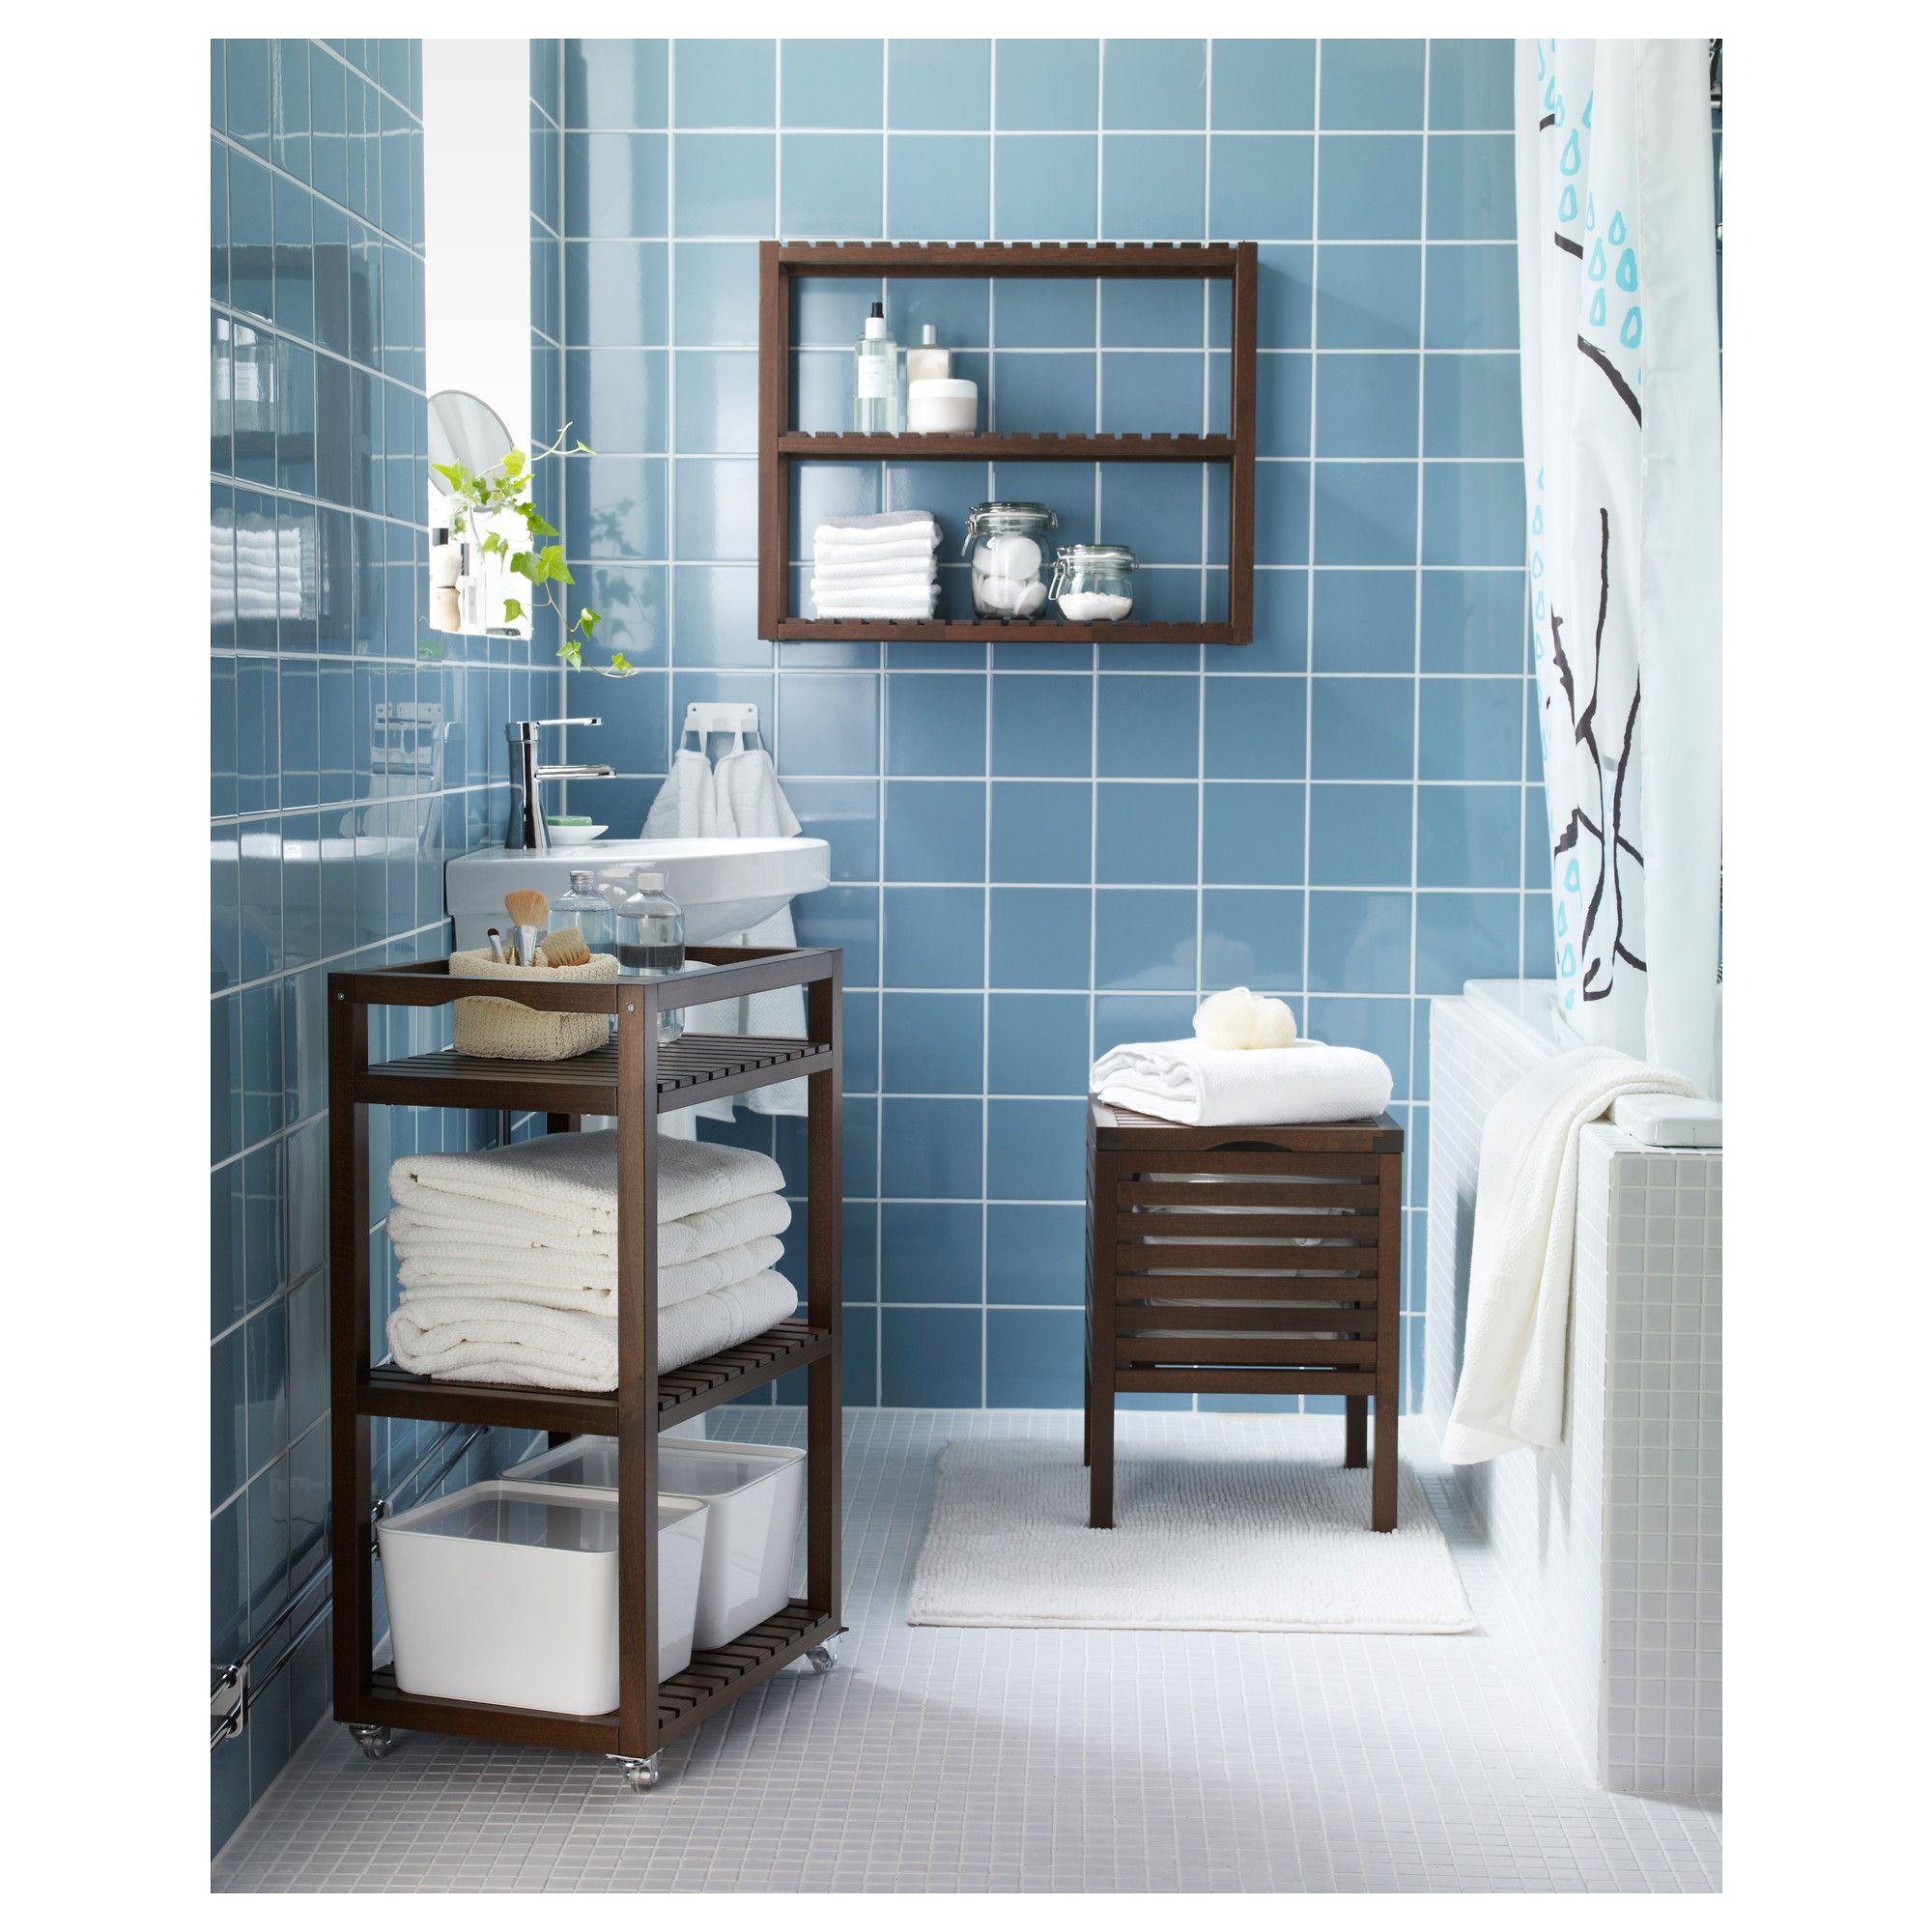 Ikea Bathroom Storage Cart | Credainatcon.com